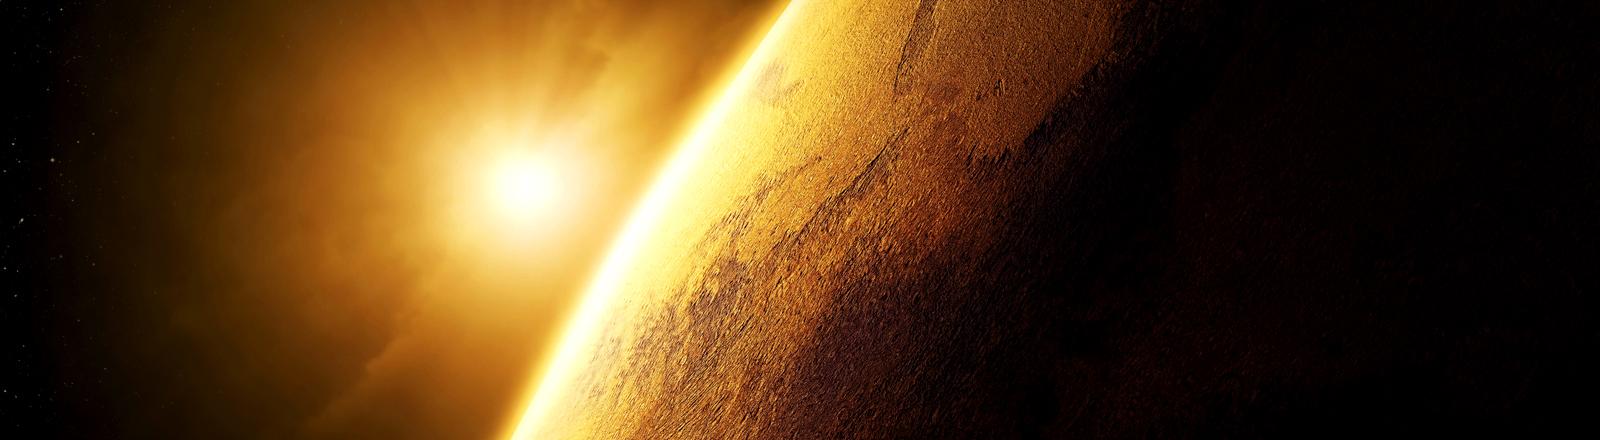 Illustration Mars-Planet